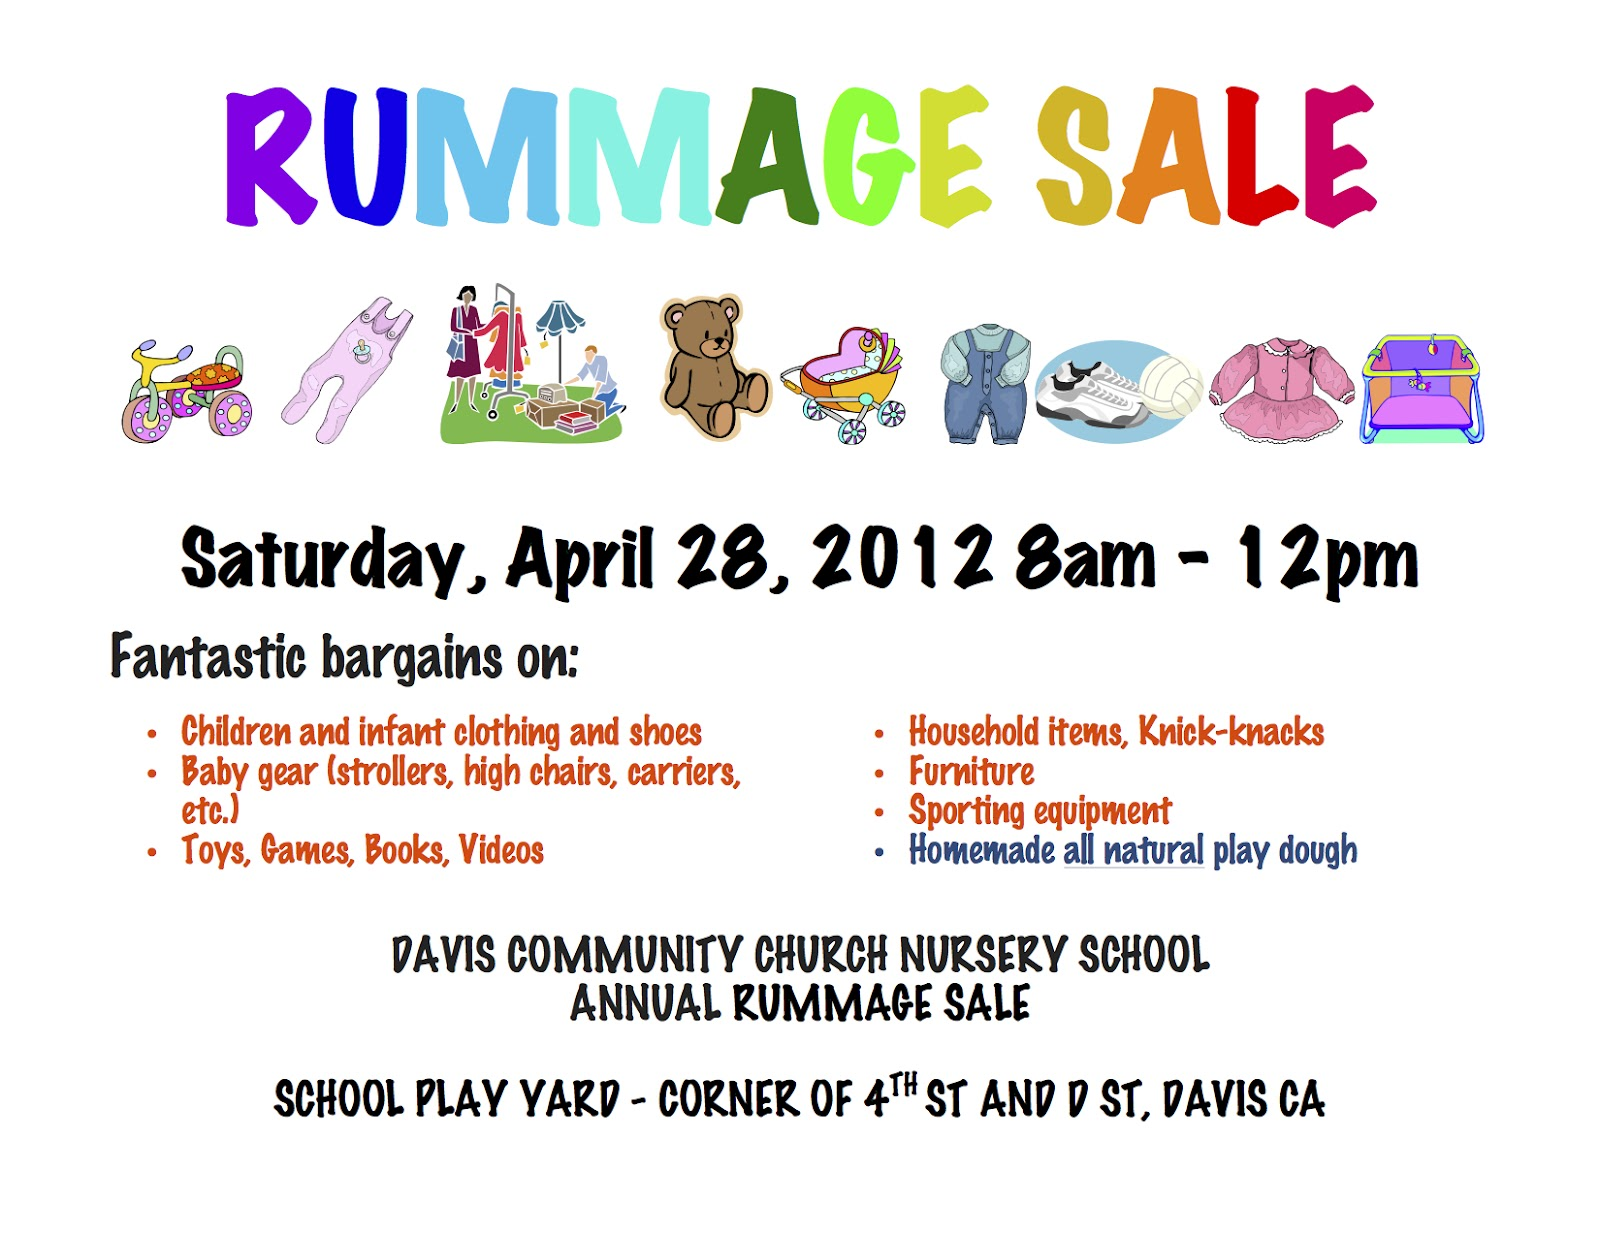 Davis Community Church Nursery School (DCCNS) Annual Rummage Sale 4